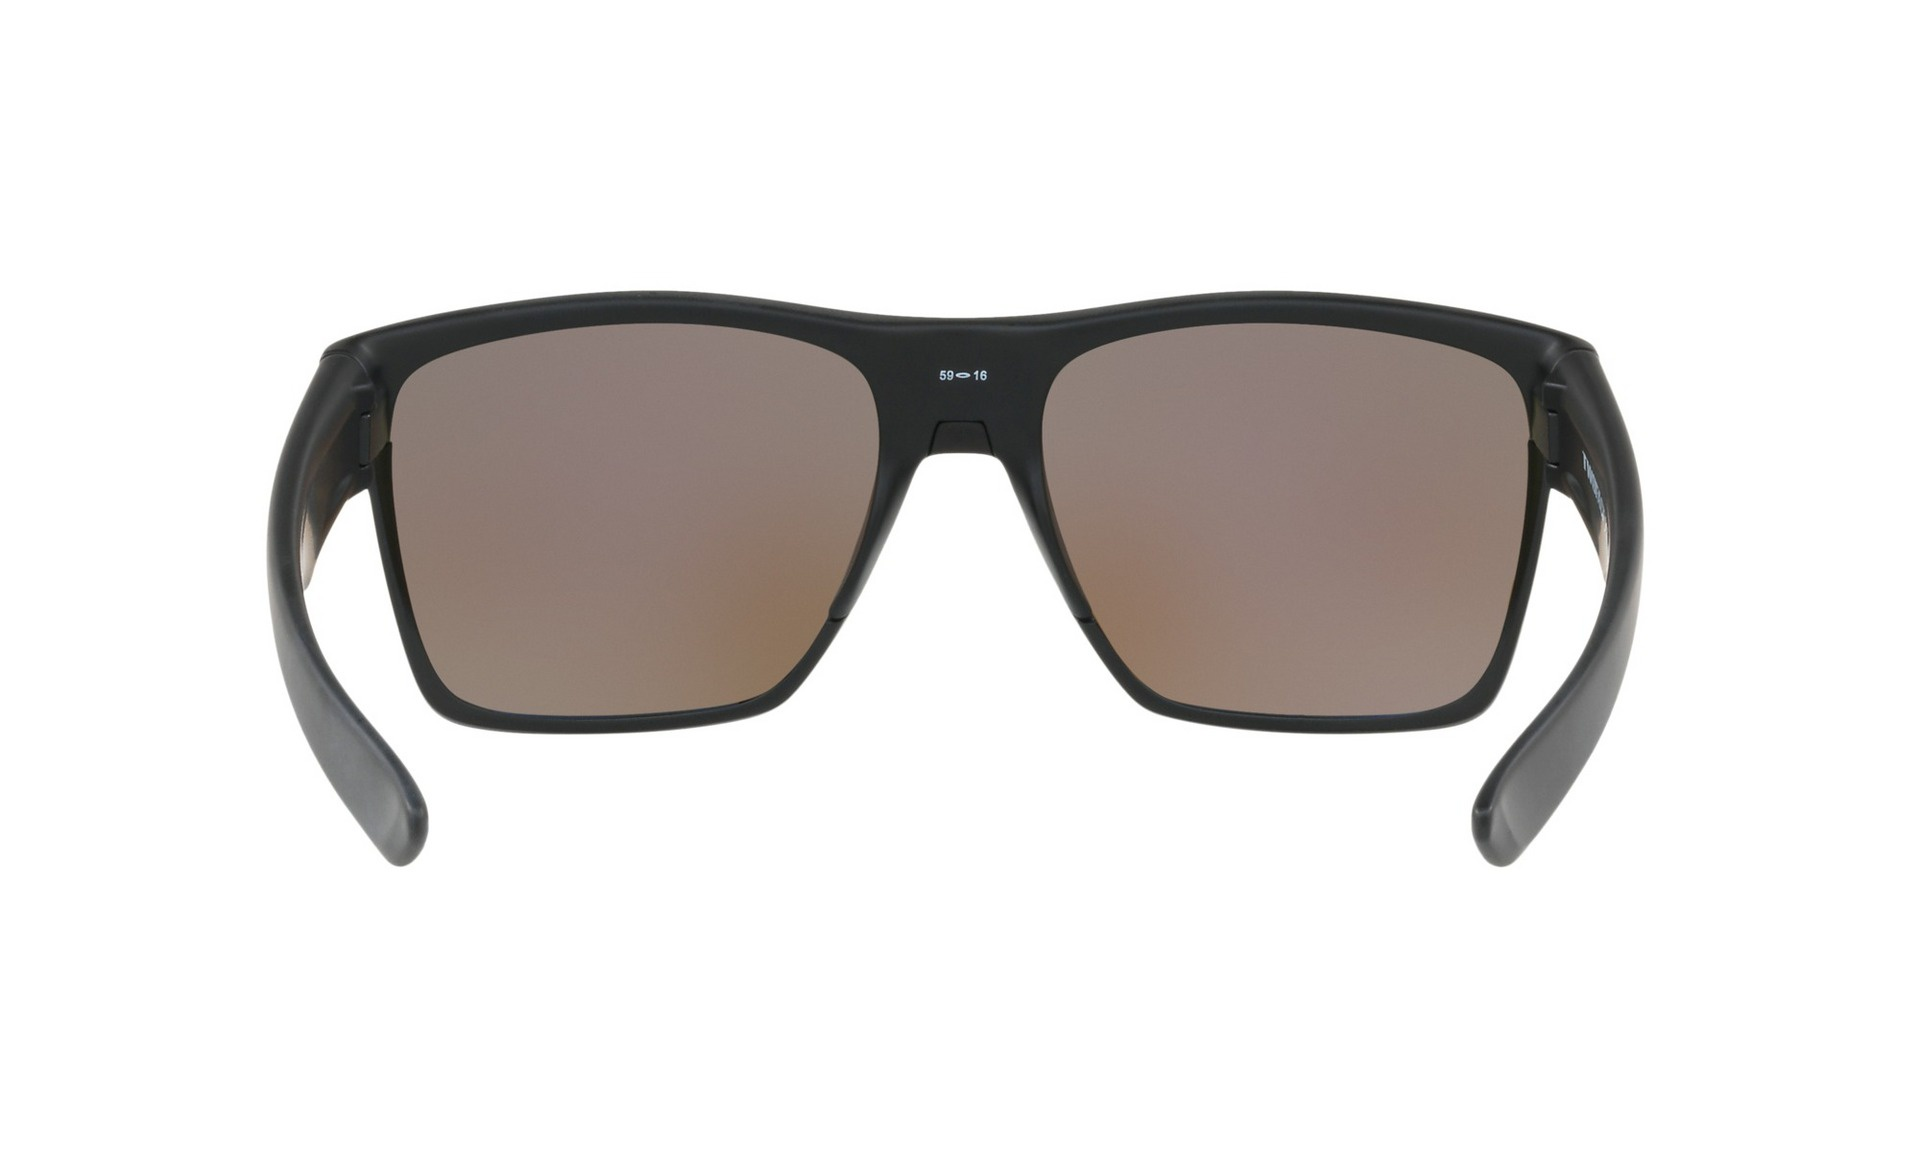 6200d2617a Oakley Two Face XL - Matte Black w Sapphire Iridium Polarized - Out ...